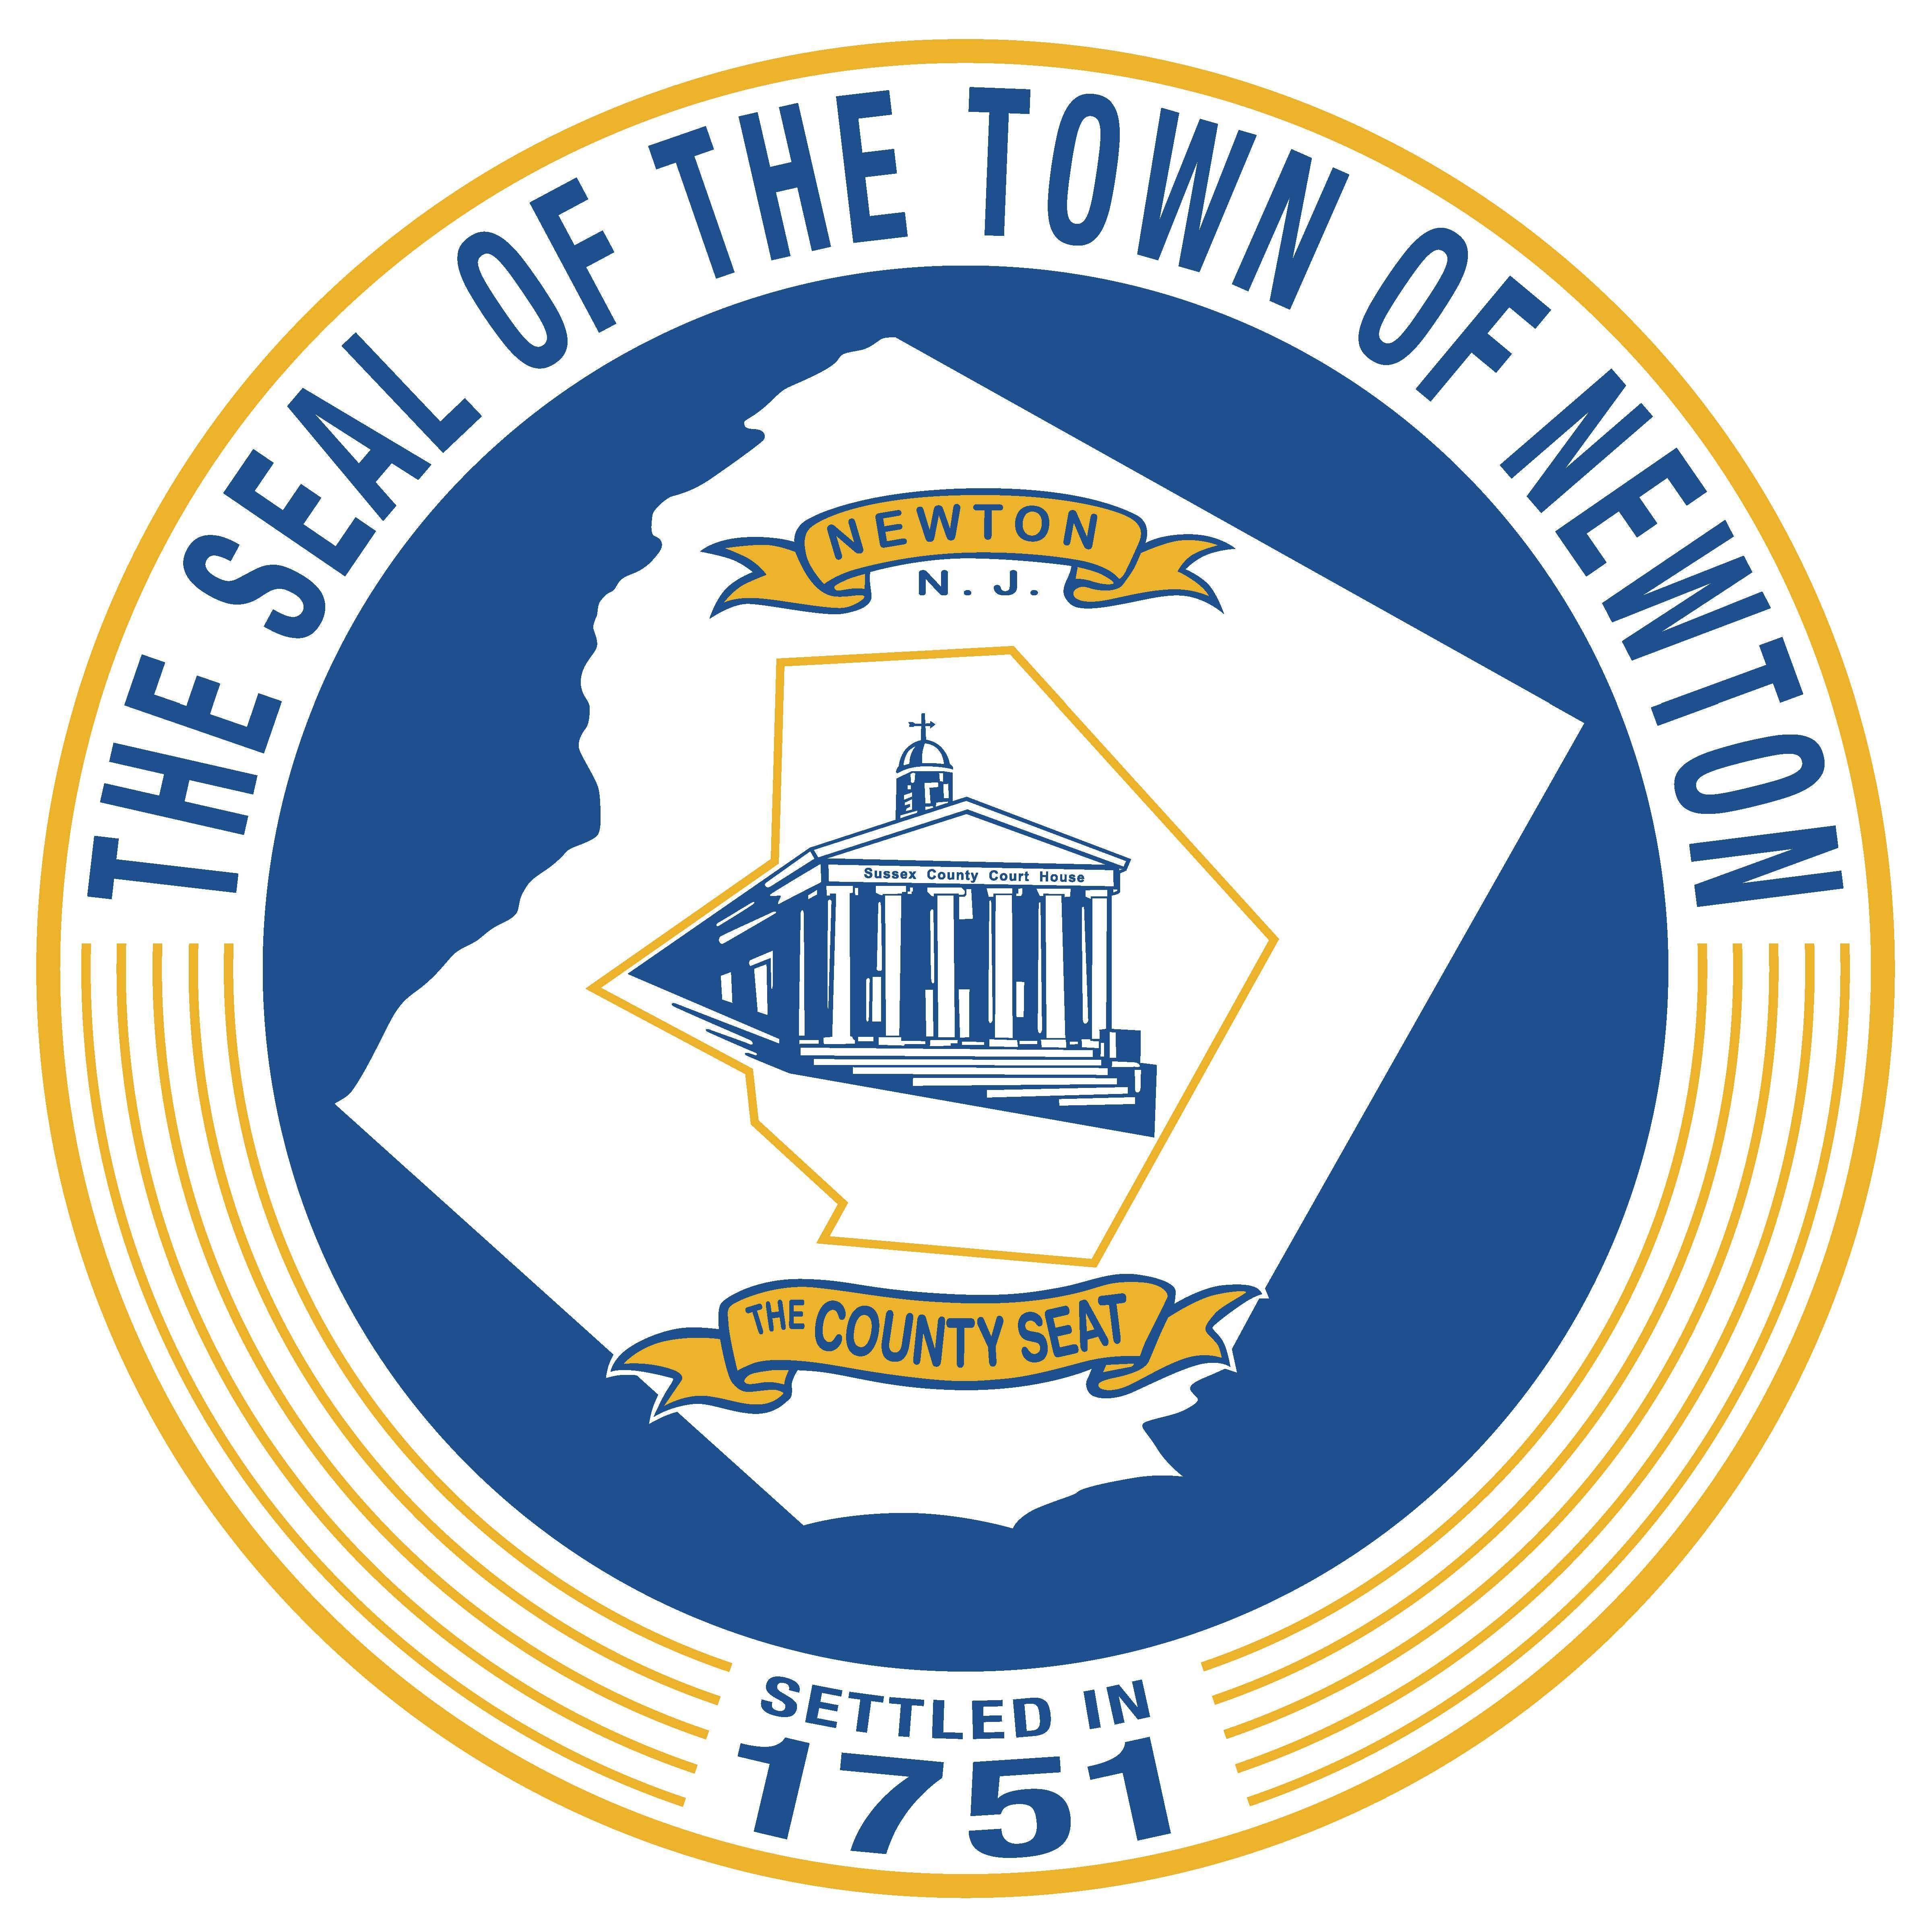 440b967cb6df216e4ac8_Town_Seal_05_blue_v1.jpg